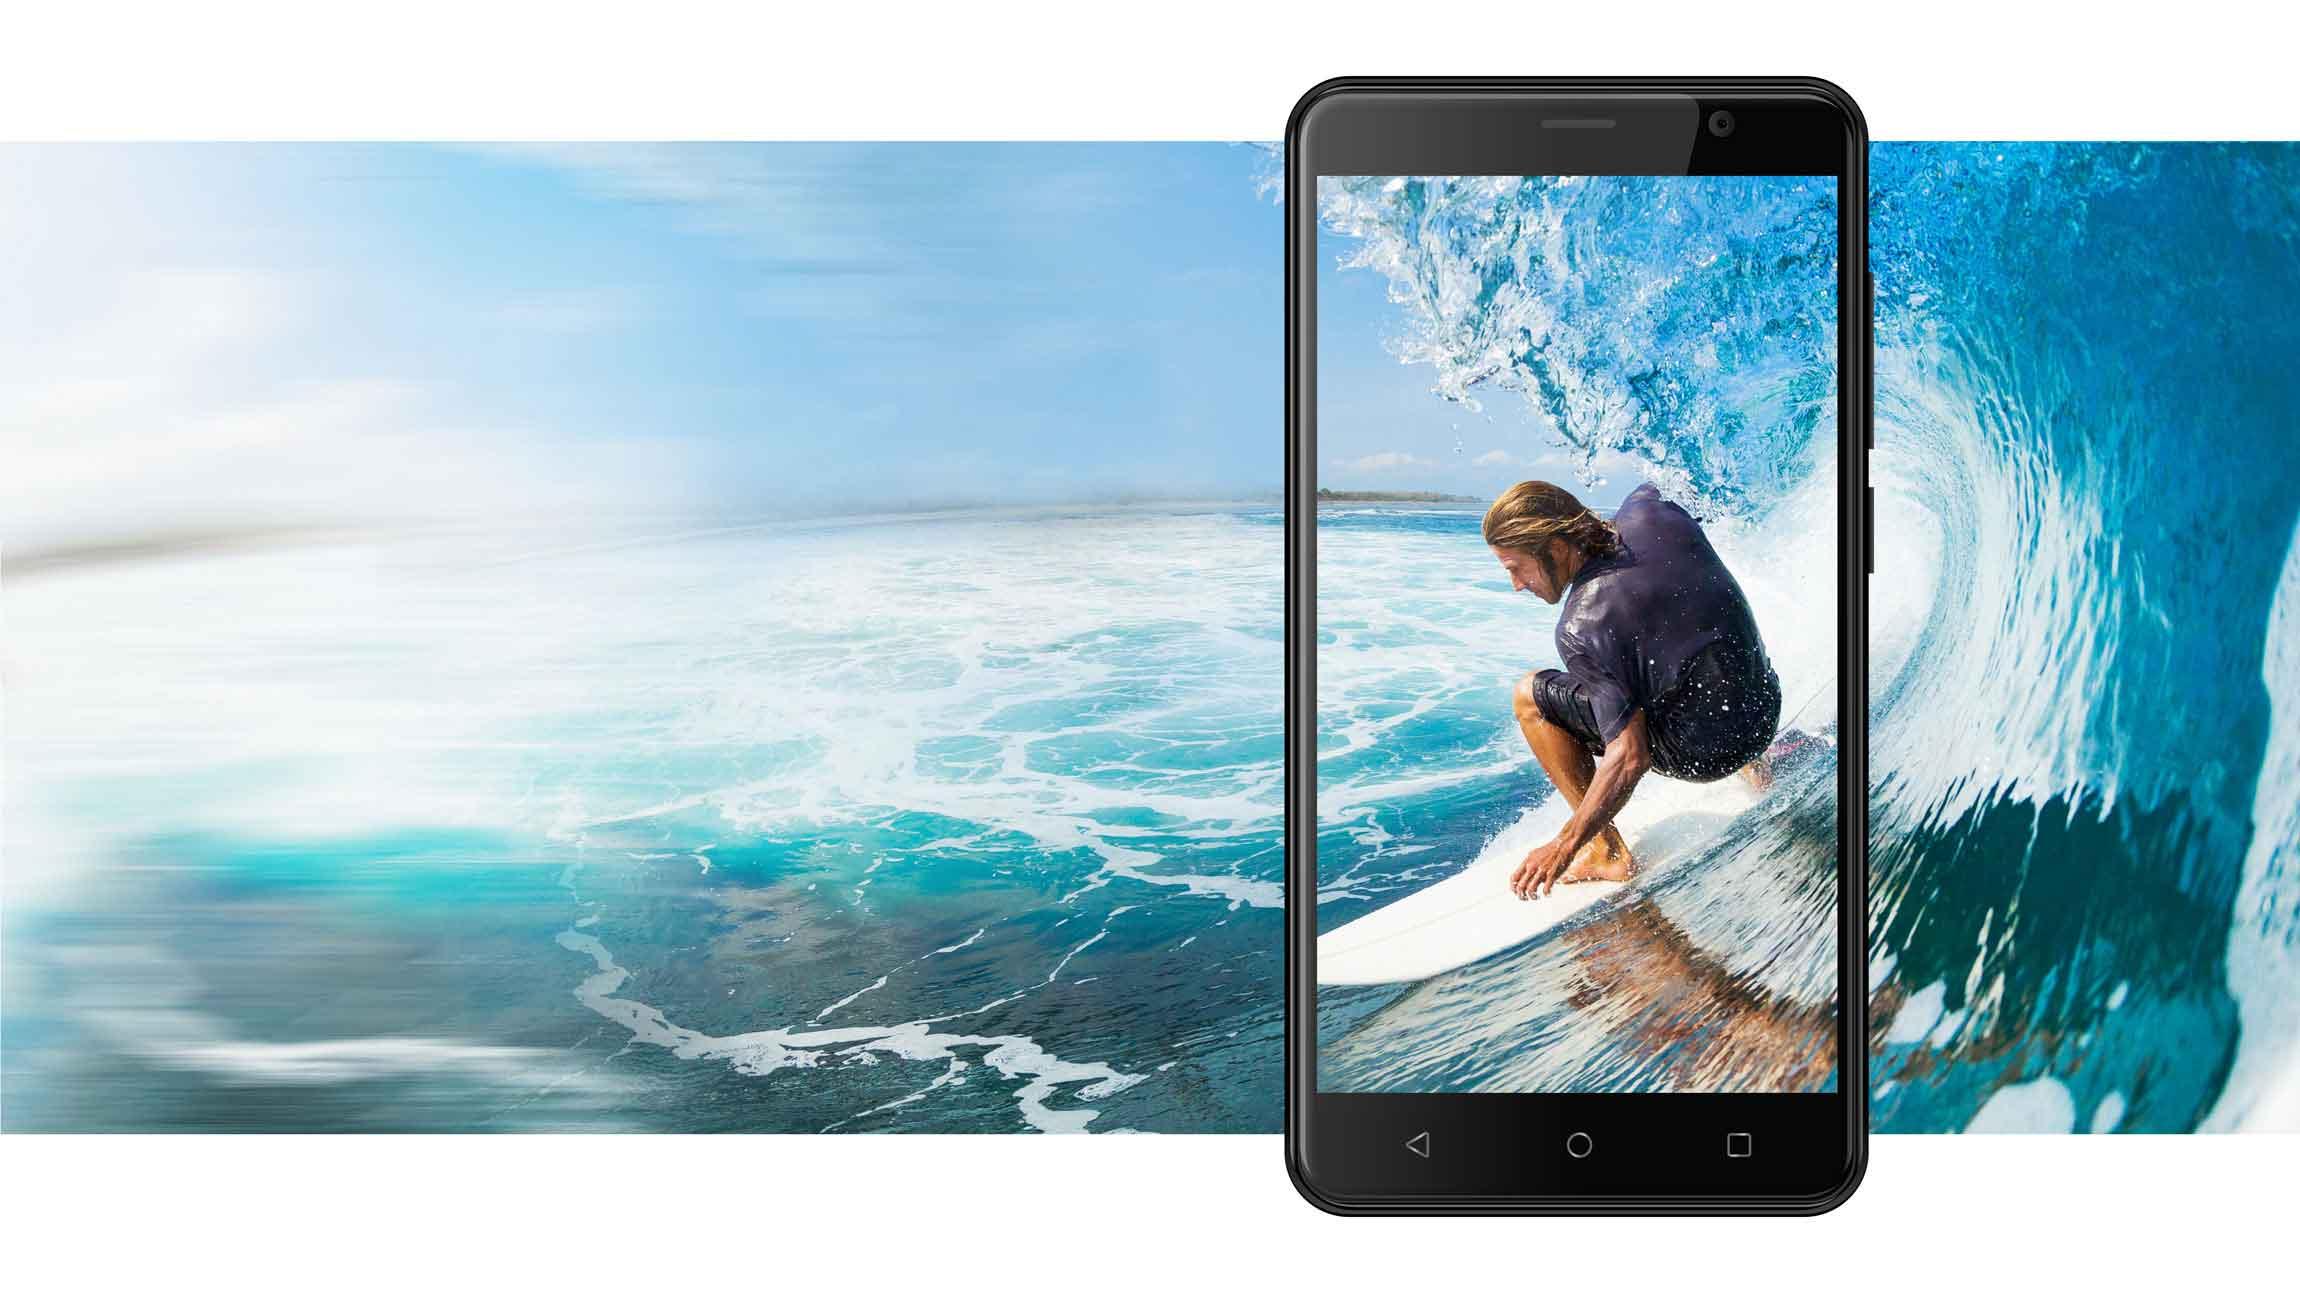 AT E500S screen - گوشی موبایل انرجایزر مدل Energizer Energy E500S با ظرفیت ۸ گیگابایت